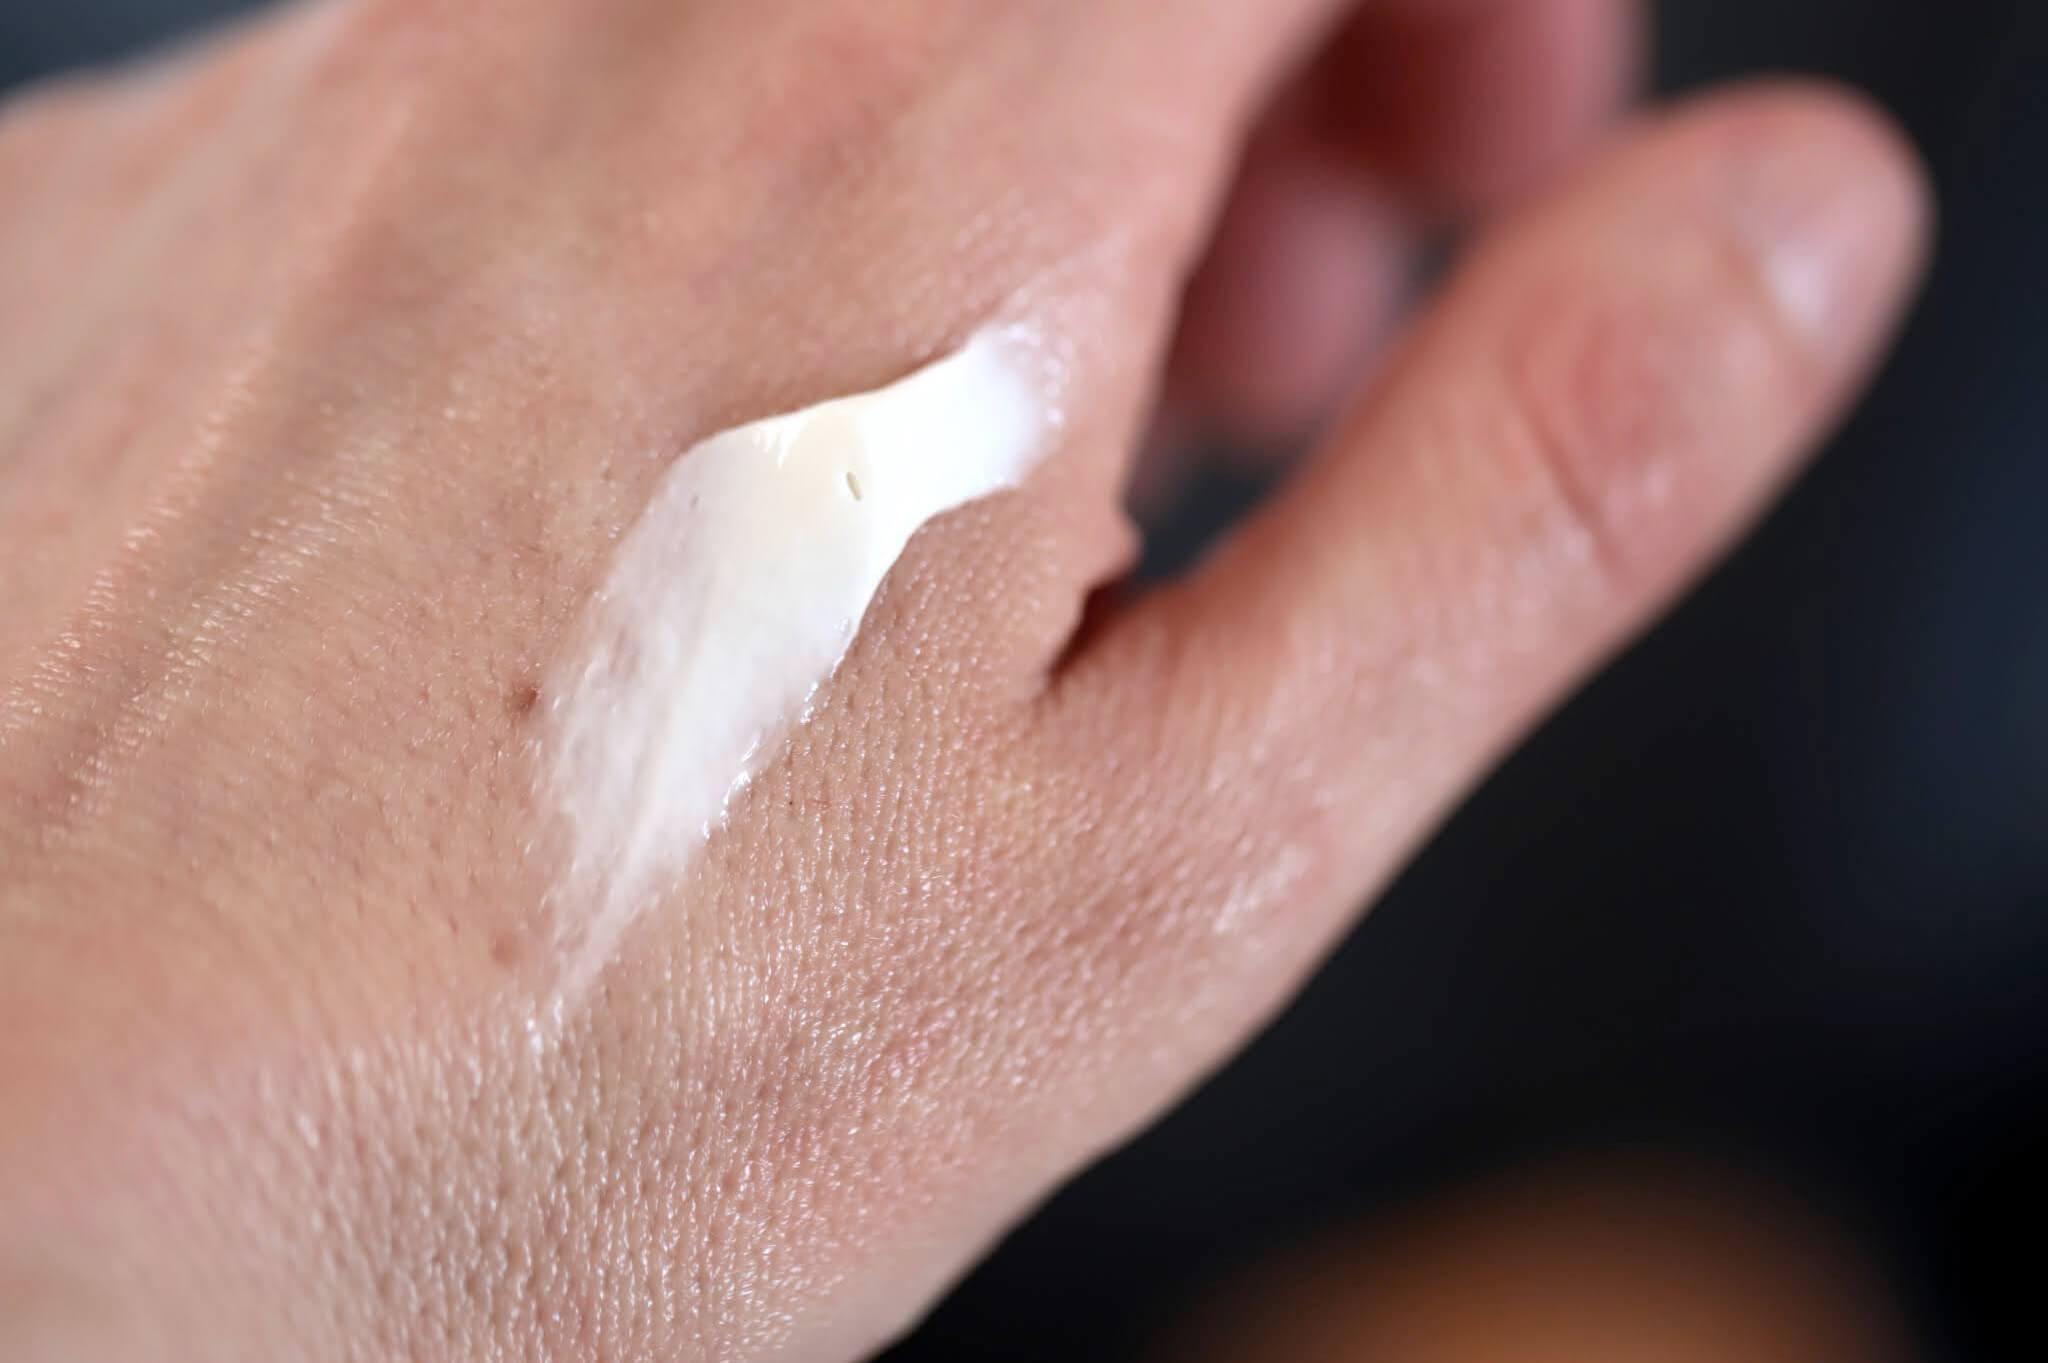 Apivita Crème Mains Hydratation Intense